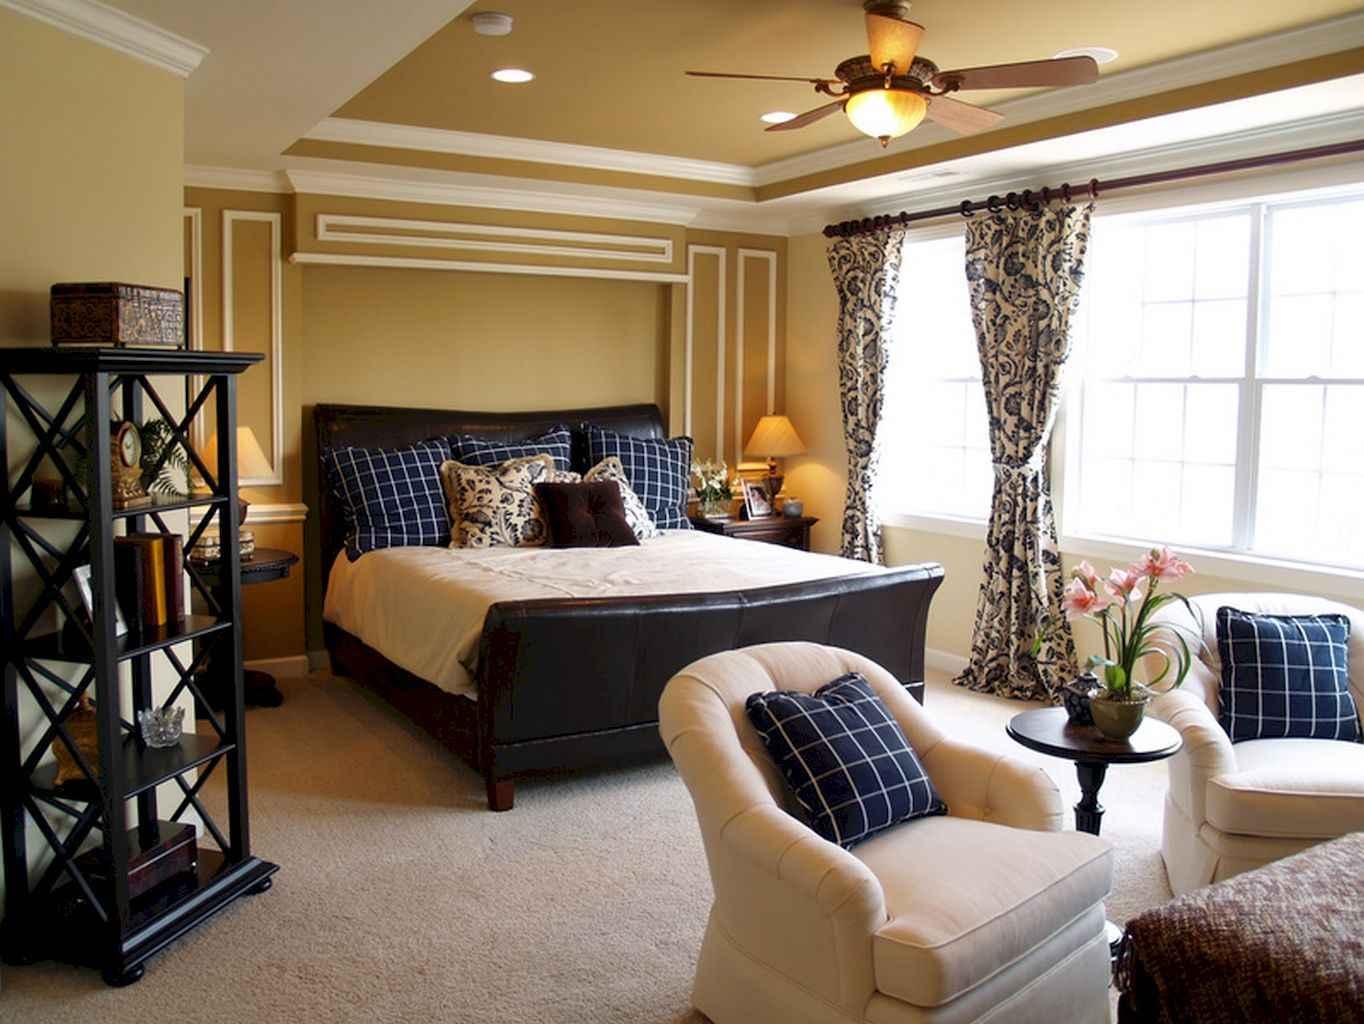 100 Stunning Farmhouse Master Bedroom Decor Ideas (85)